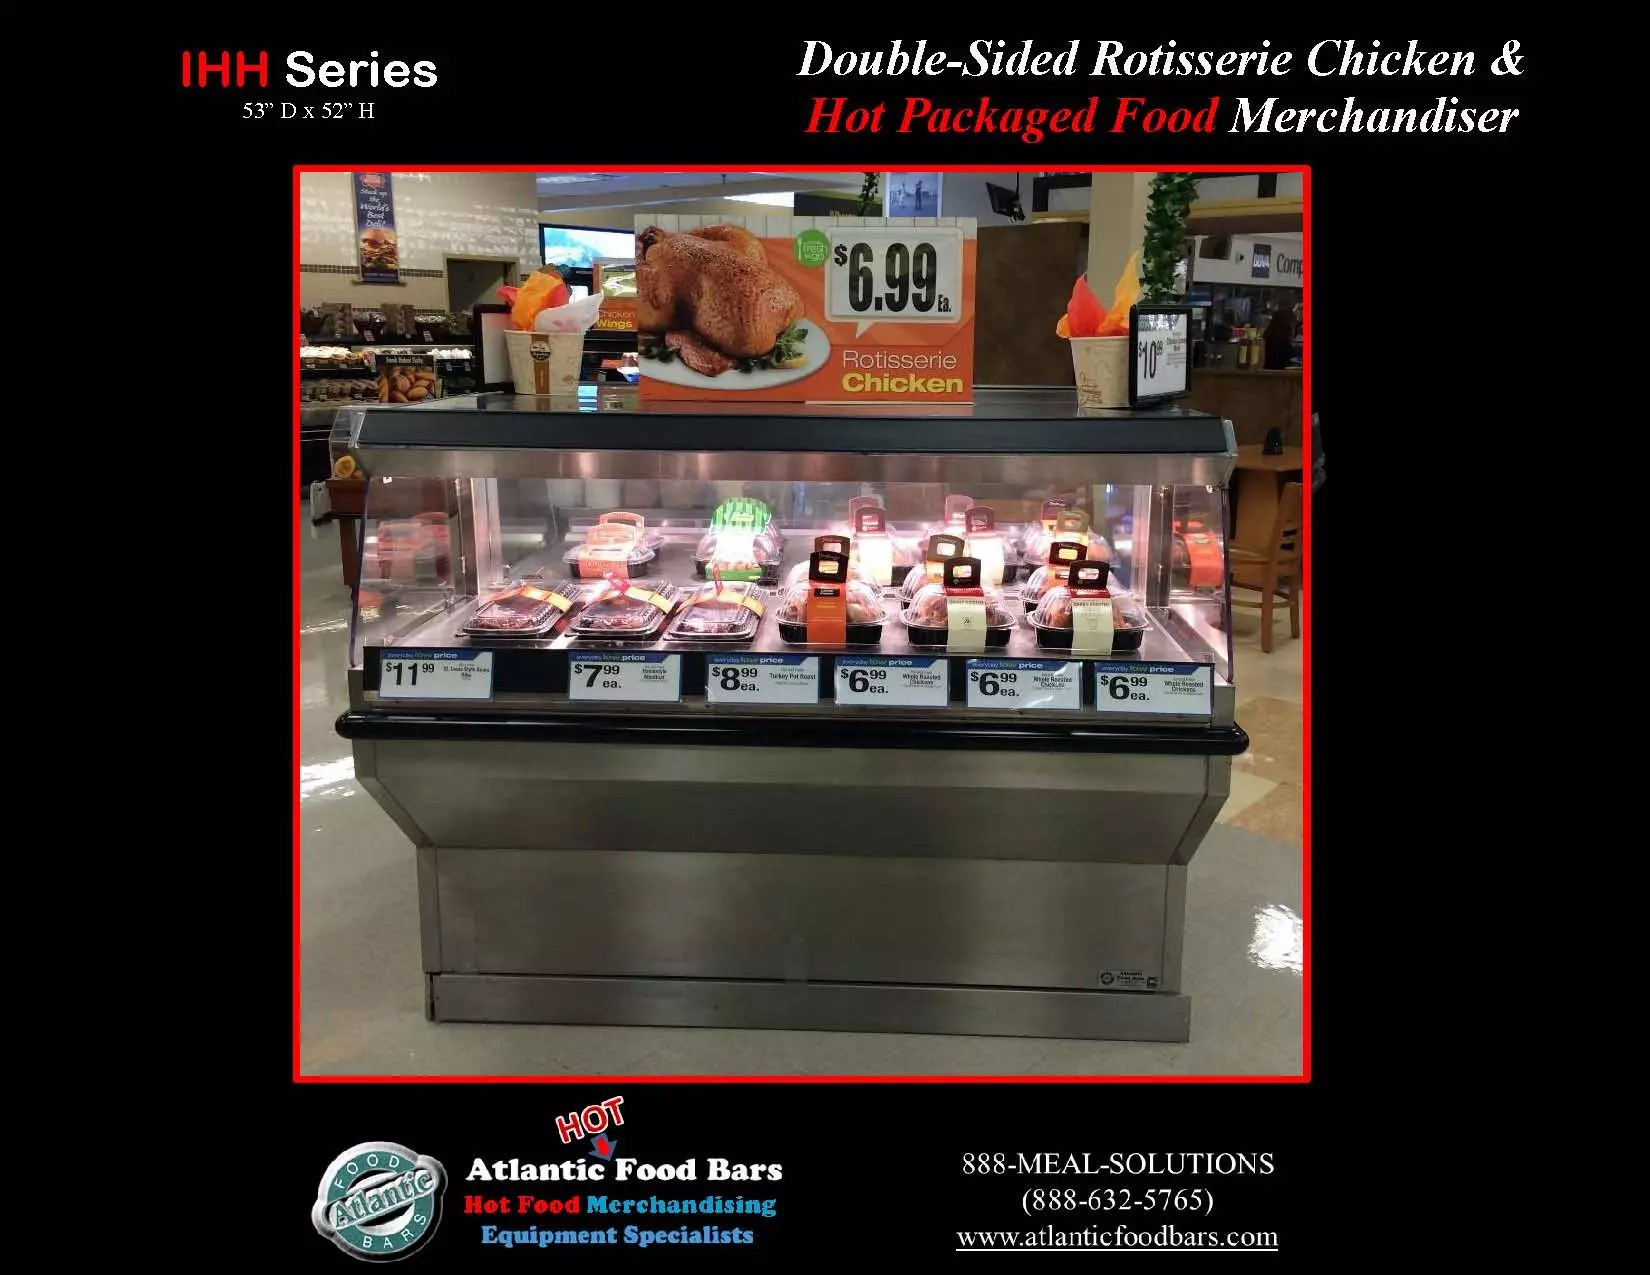 Atlantic Food Bars Double Sided Chicken Merchandiser